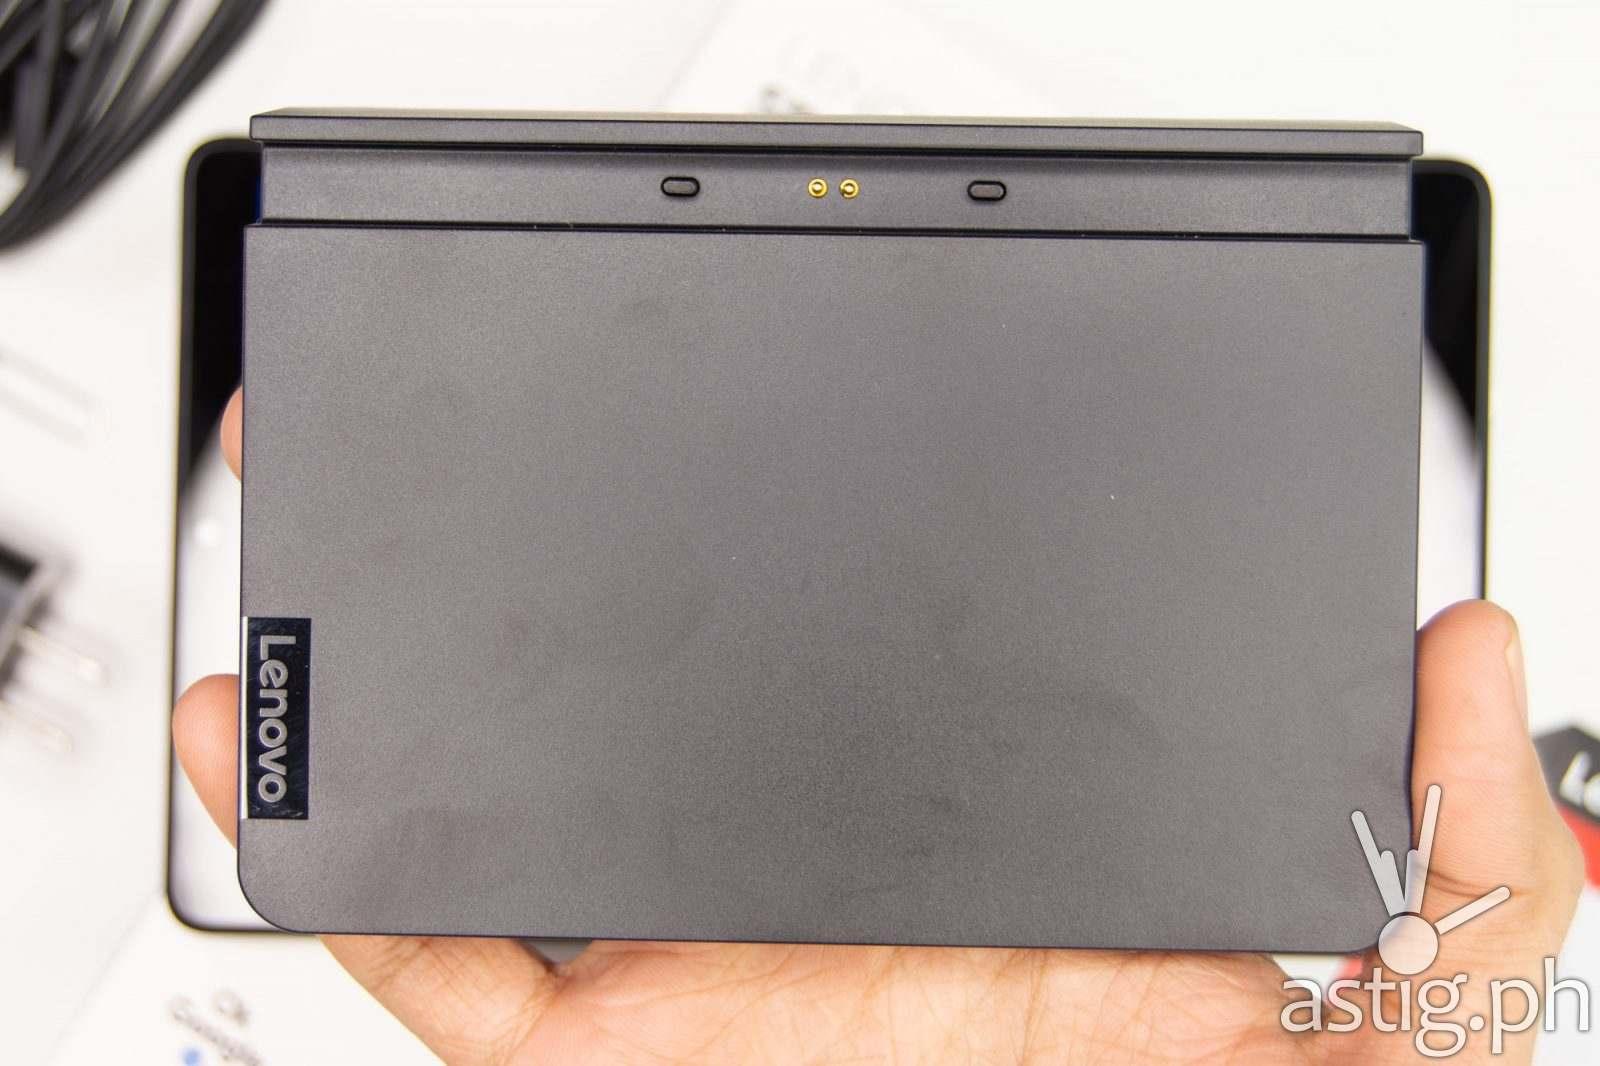 Dock handheld - Lenovo Smart Tab M8 (Philippines)